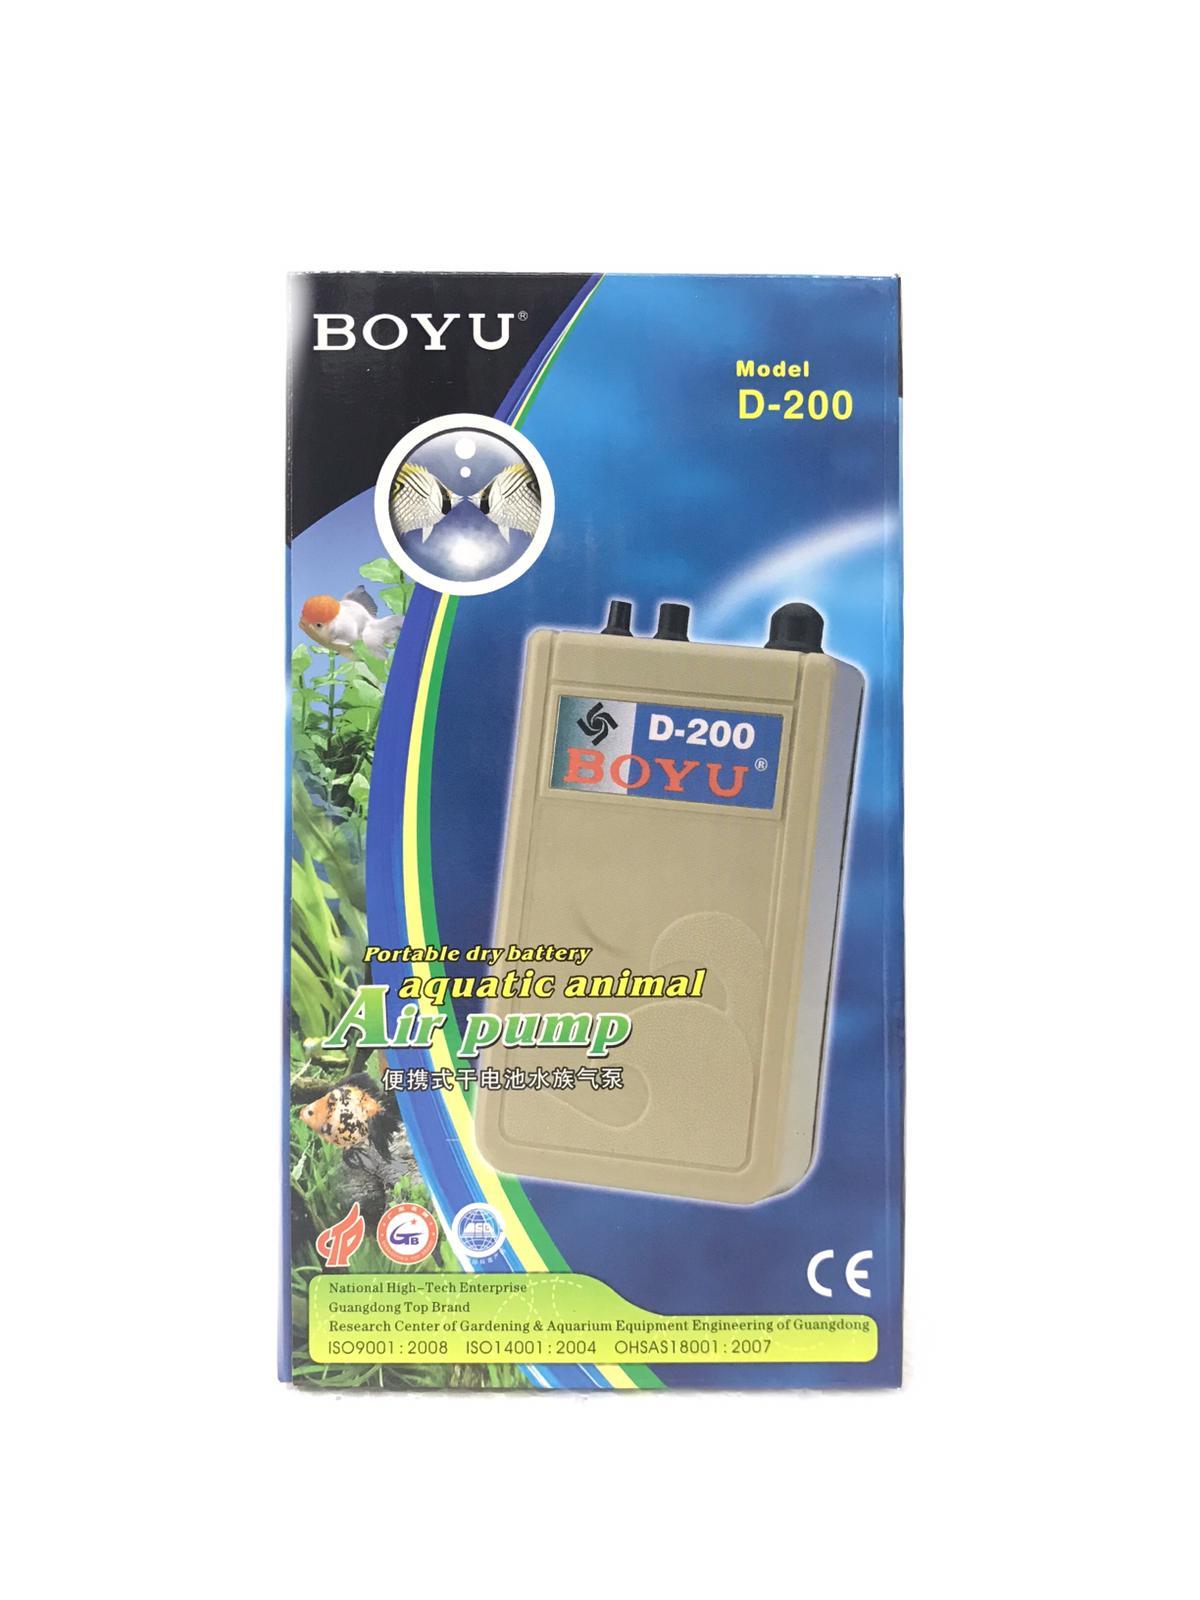 Boyu Portable Dry Battery Air Pump